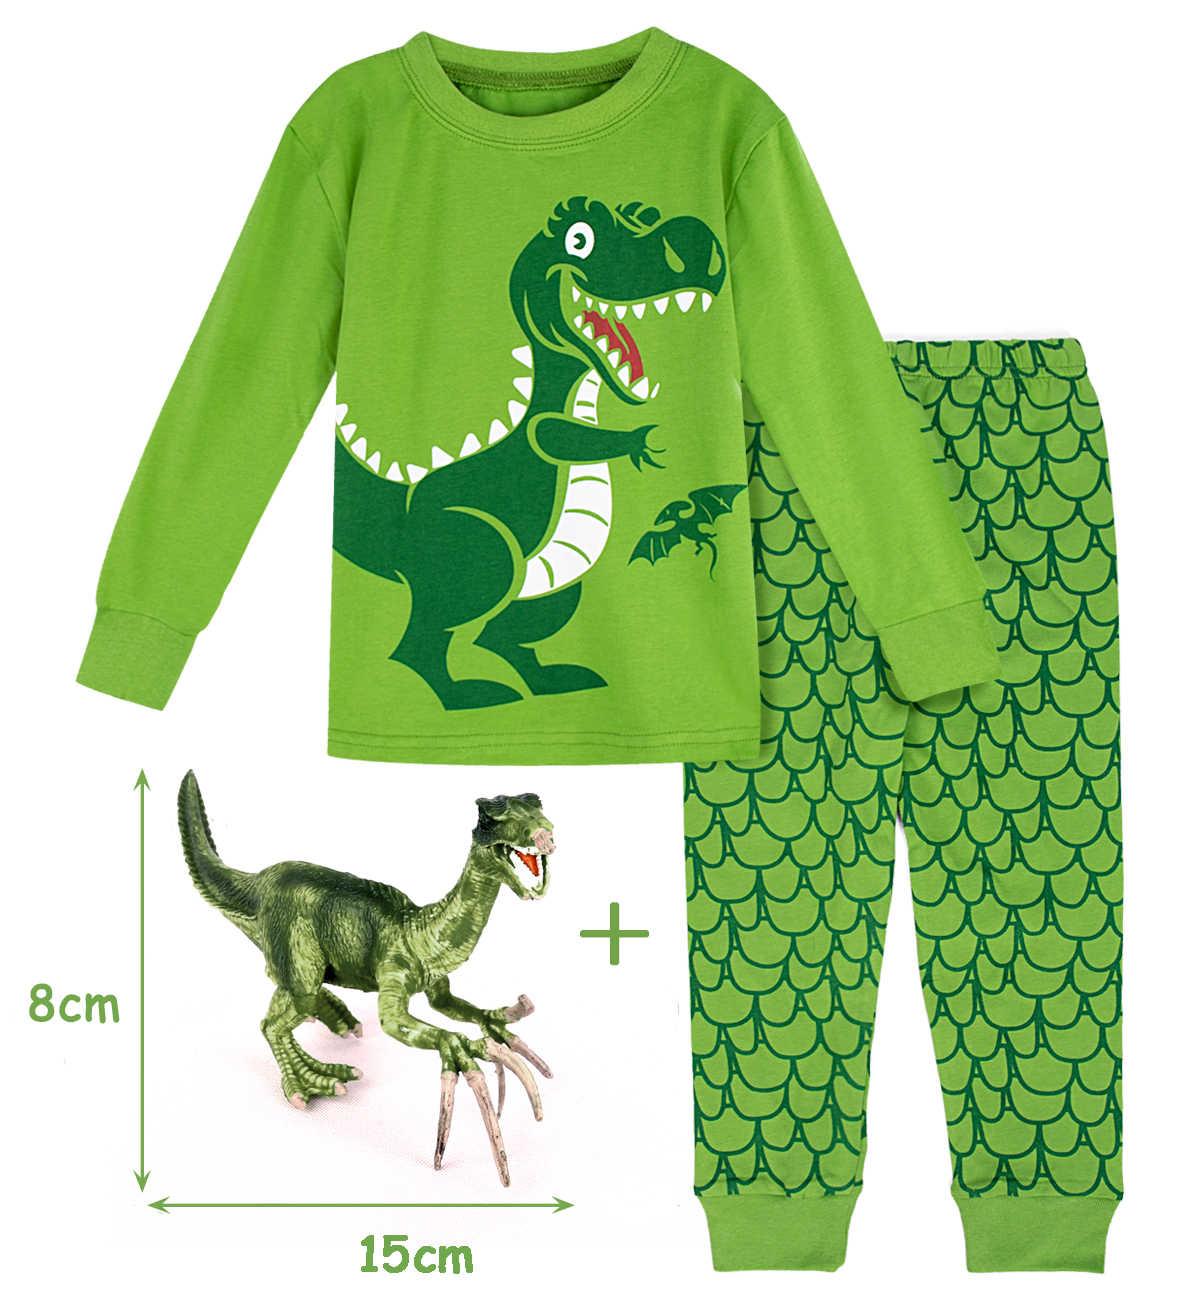 Kids Boy Winter Pyjamas Children Dinosaur Pijamas Cartoon Robot Digger Airplane Boy Pajamas Child Shark Sleepwear Car Nightwear